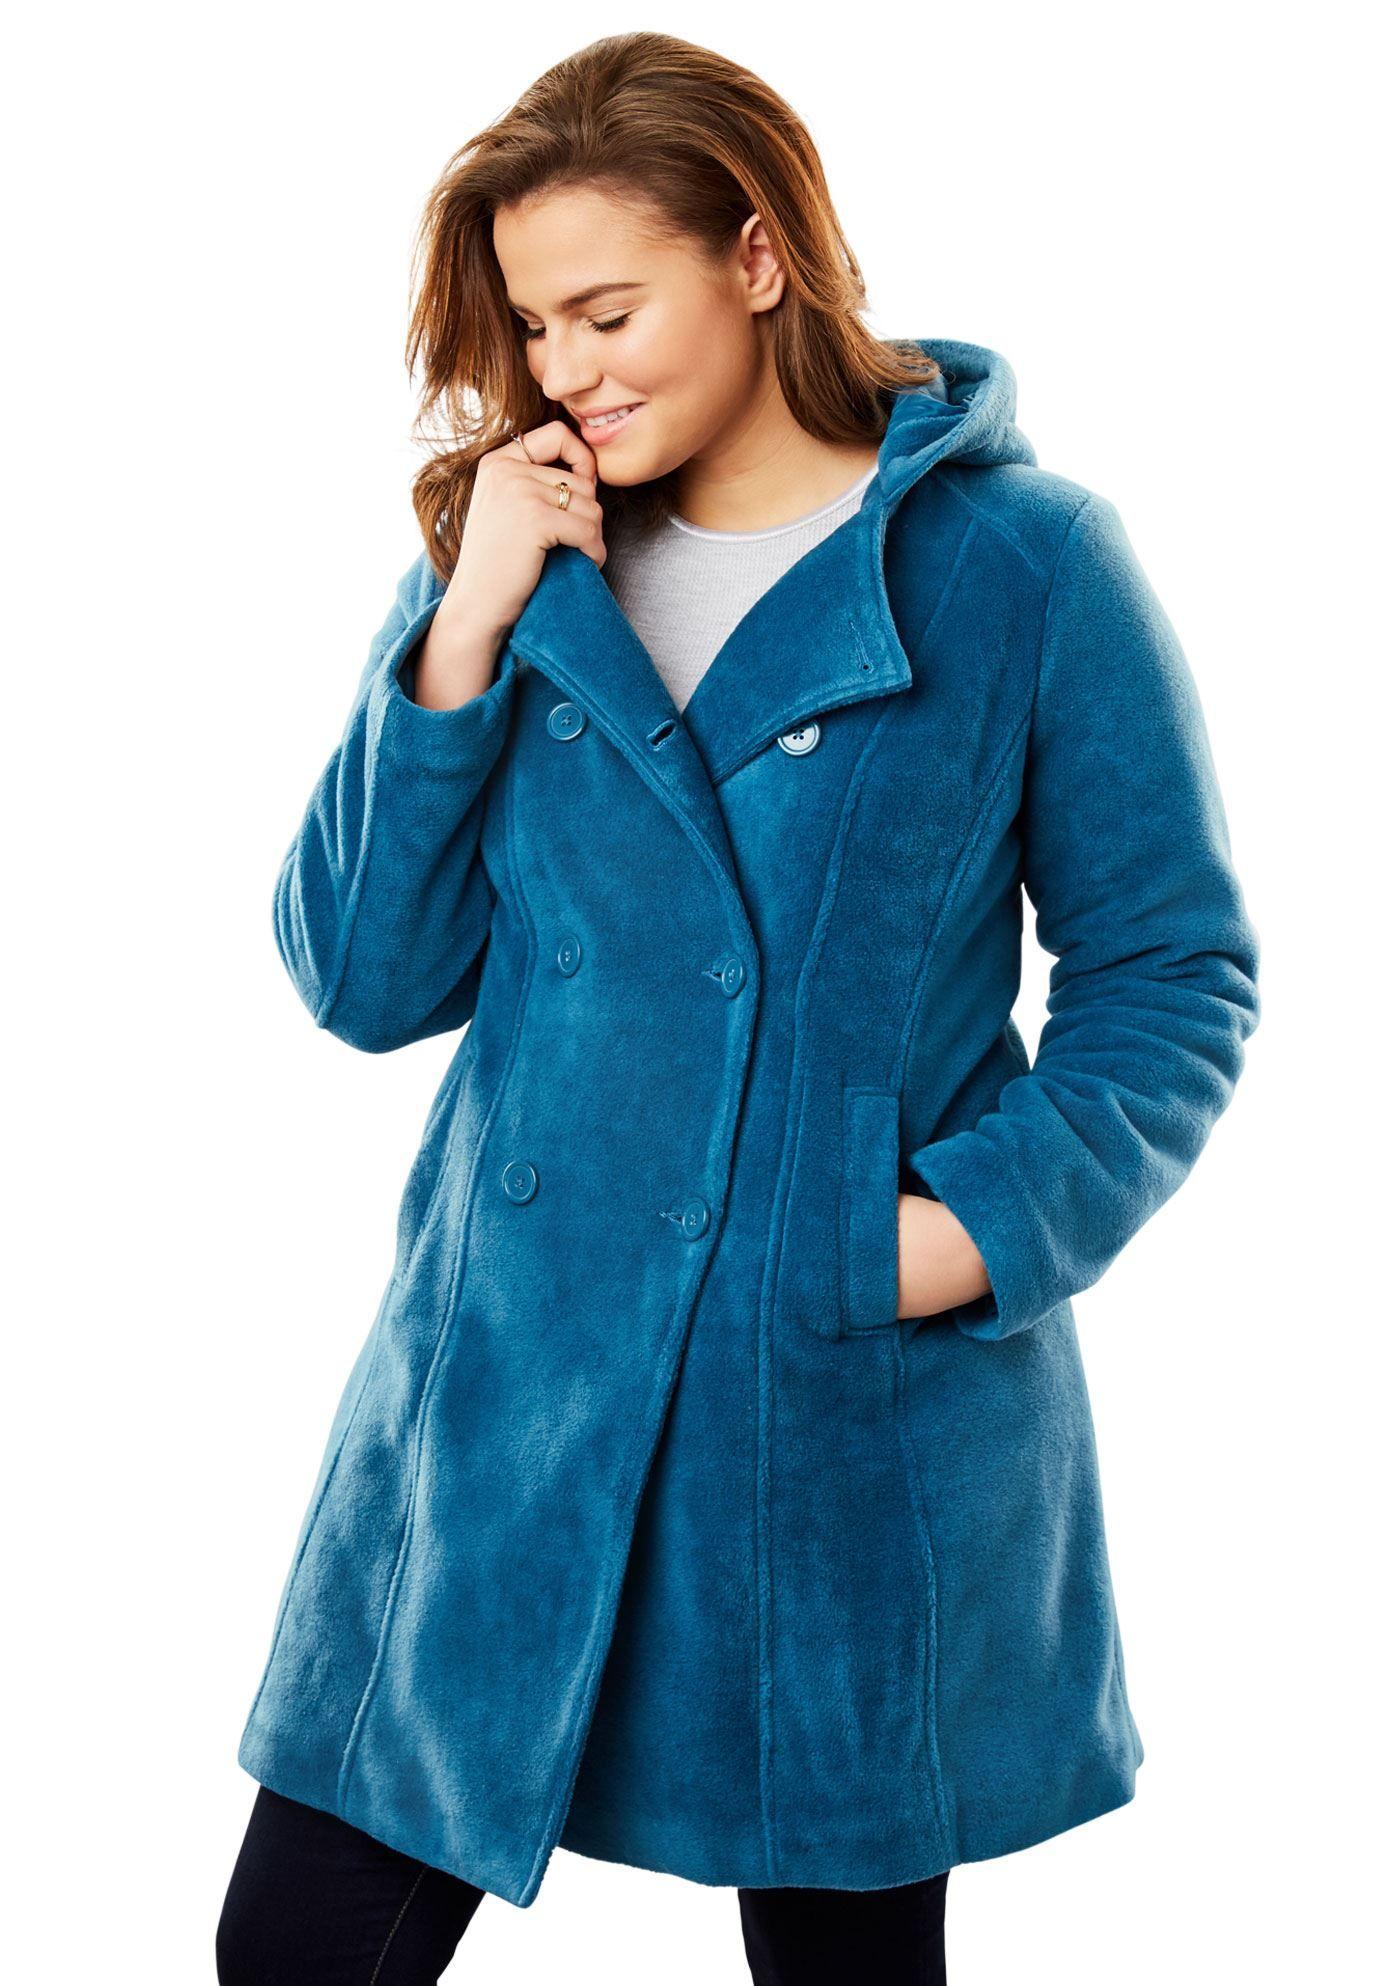 Hooded Fleece Pea Coat Women S Plus Size Clothing Woolcoatplussize Plus Size Coats Coats For Women Pea Coats Women [ 1986 x 1380 Pixel ]